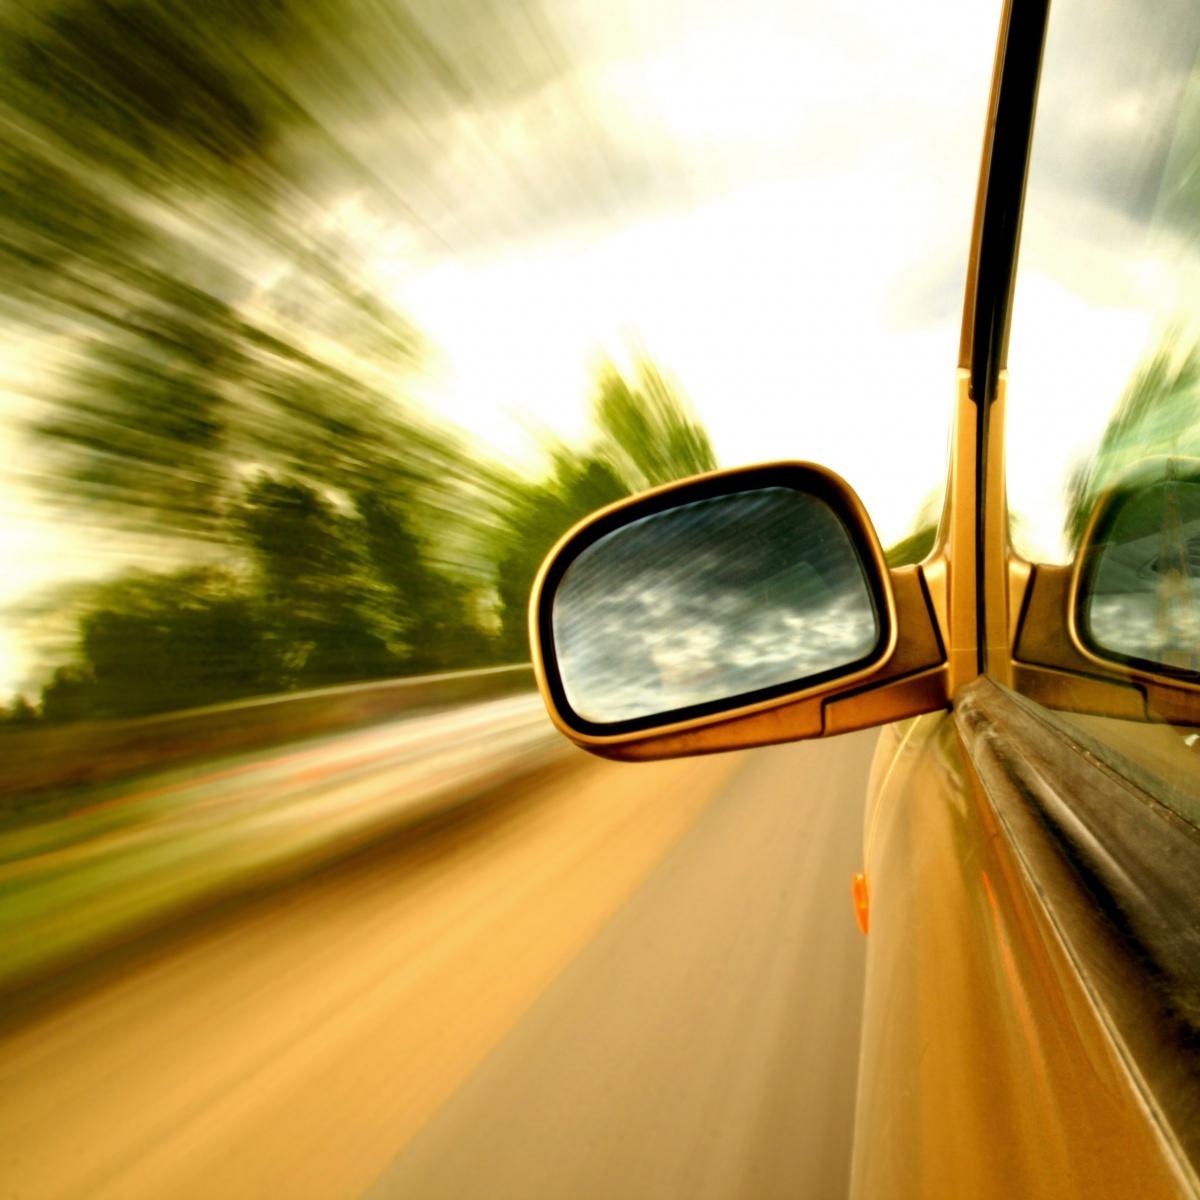 Зеркало автомобиля - Car mirror